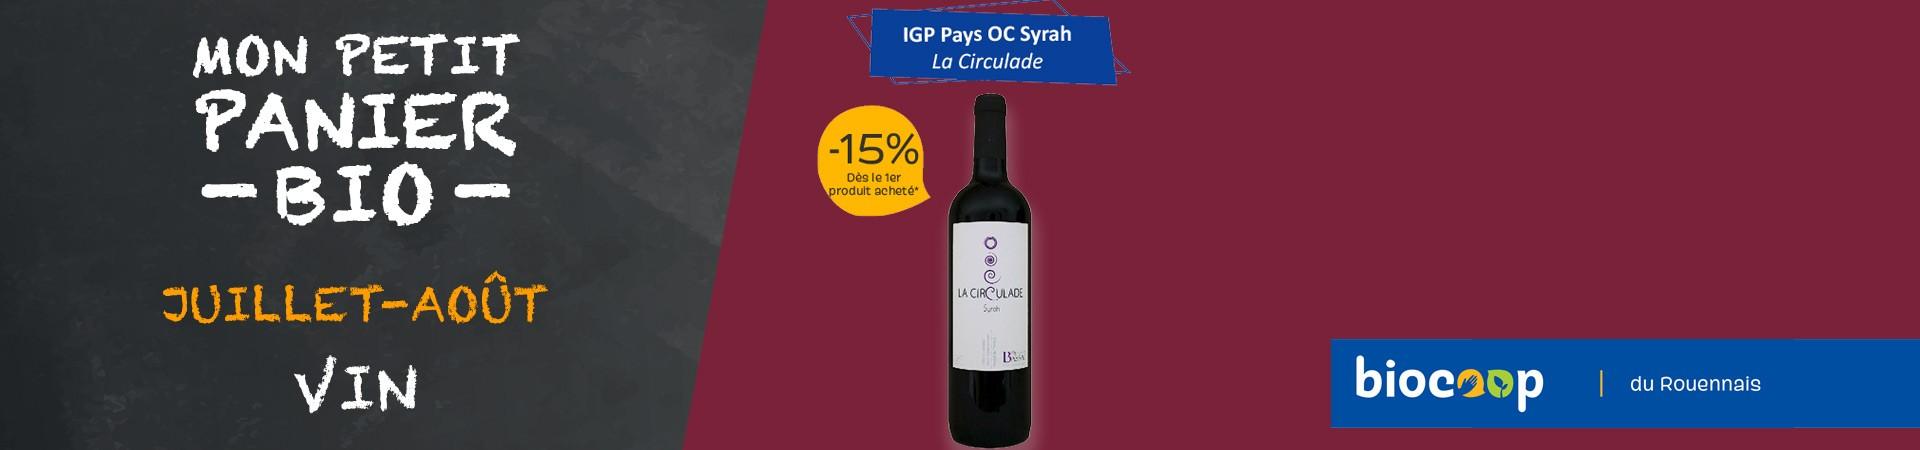 IGP Pays OC Syrah La Circulade